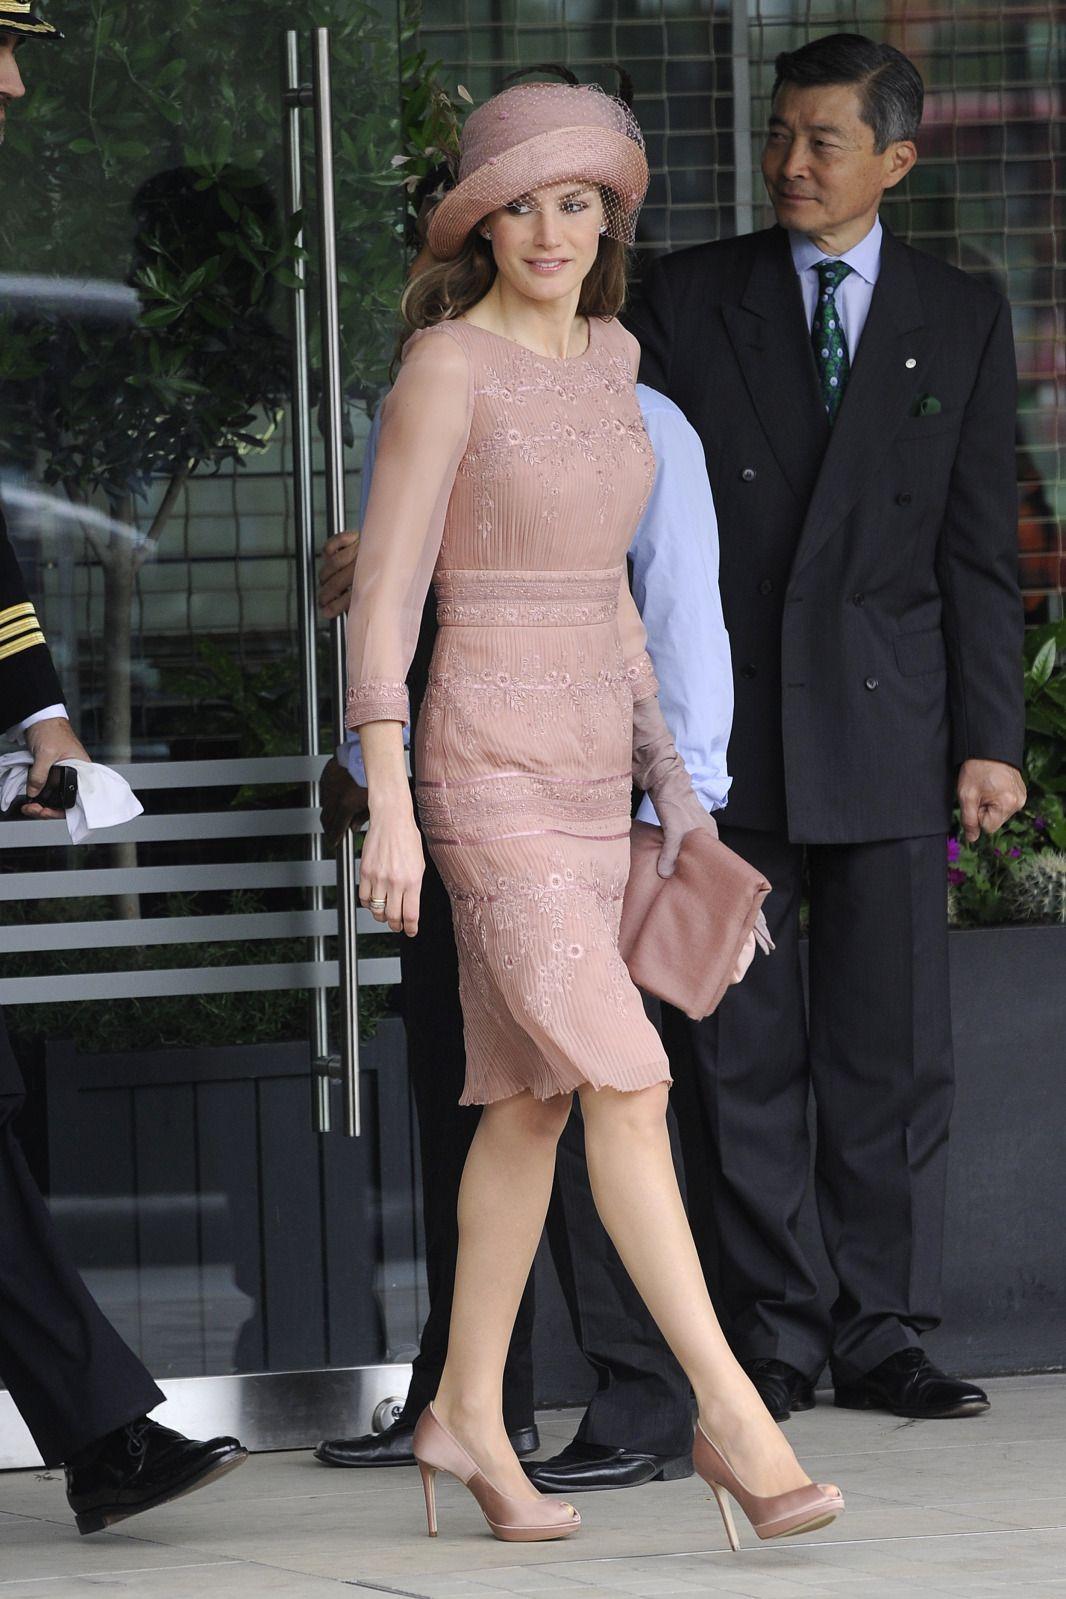 d2dfa4c145 Princesa Letizia de España (Spain). LAS 10 BODAS DE LETIZIA